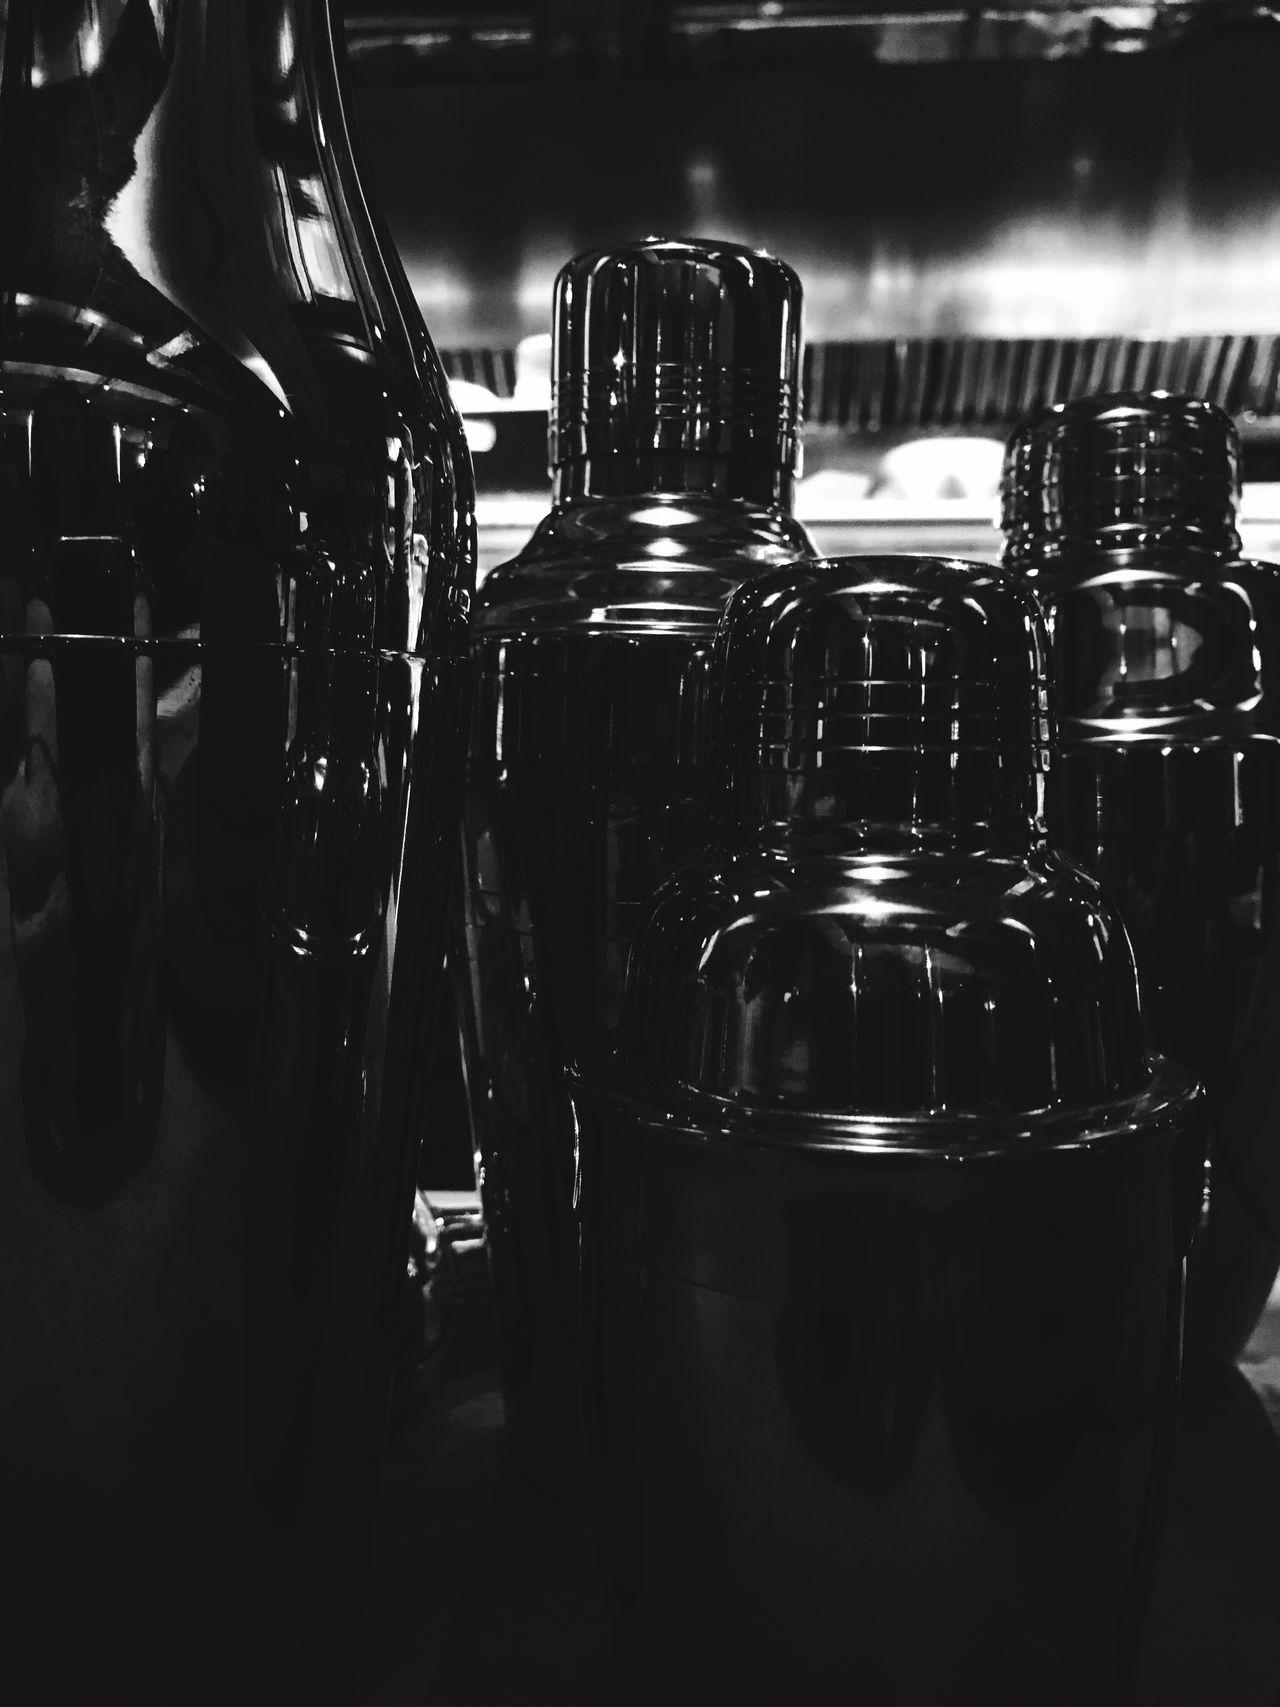 No People Bottle Drink Bar Monochrome Monochrome Photography Black & White Blackandwhite Shaker Shakers Dark Black Backgrounds Shiny Metal Metallic